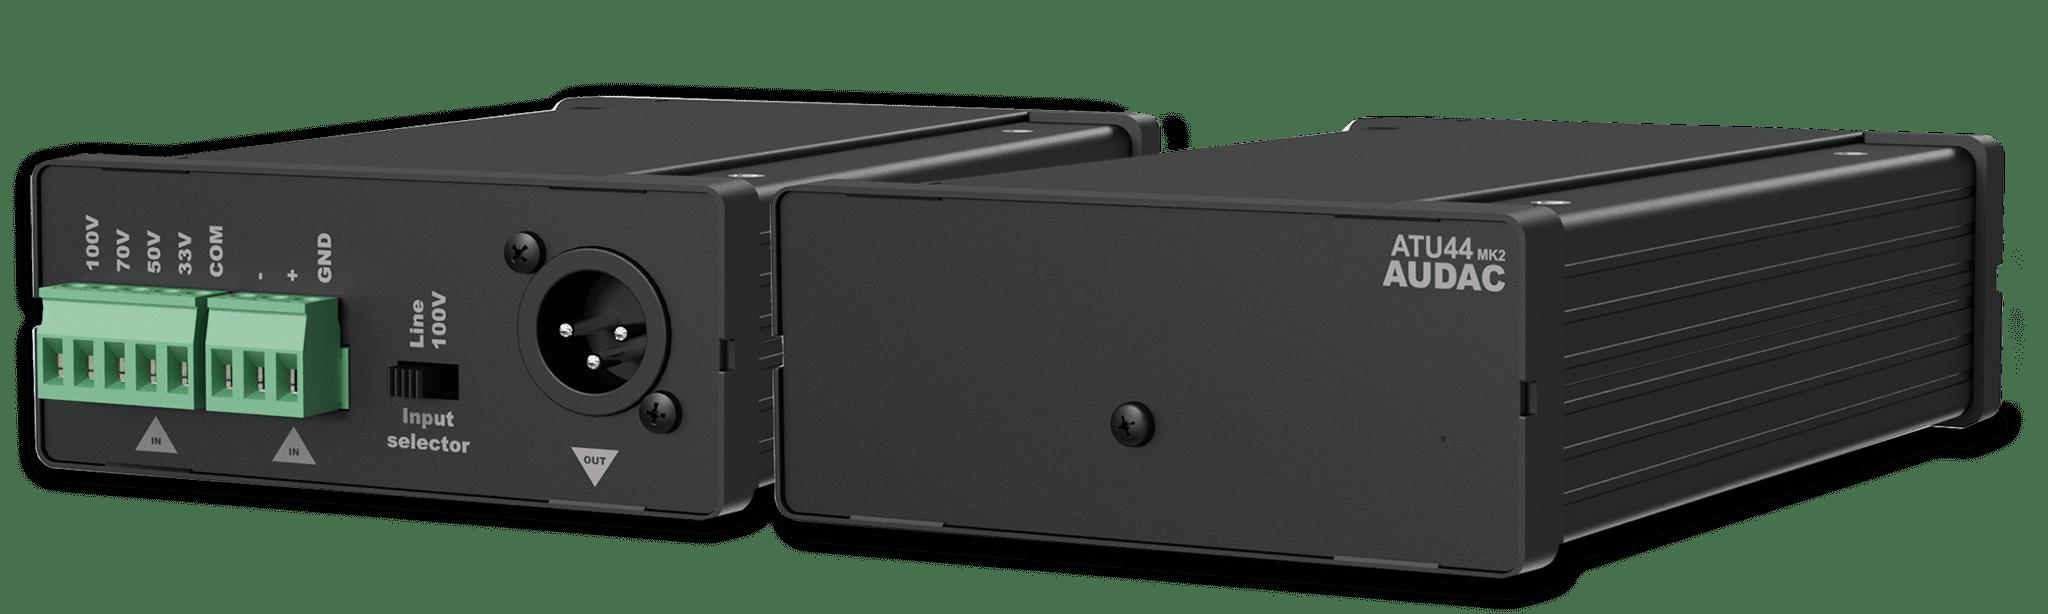 ATU44 - Universal input adapter